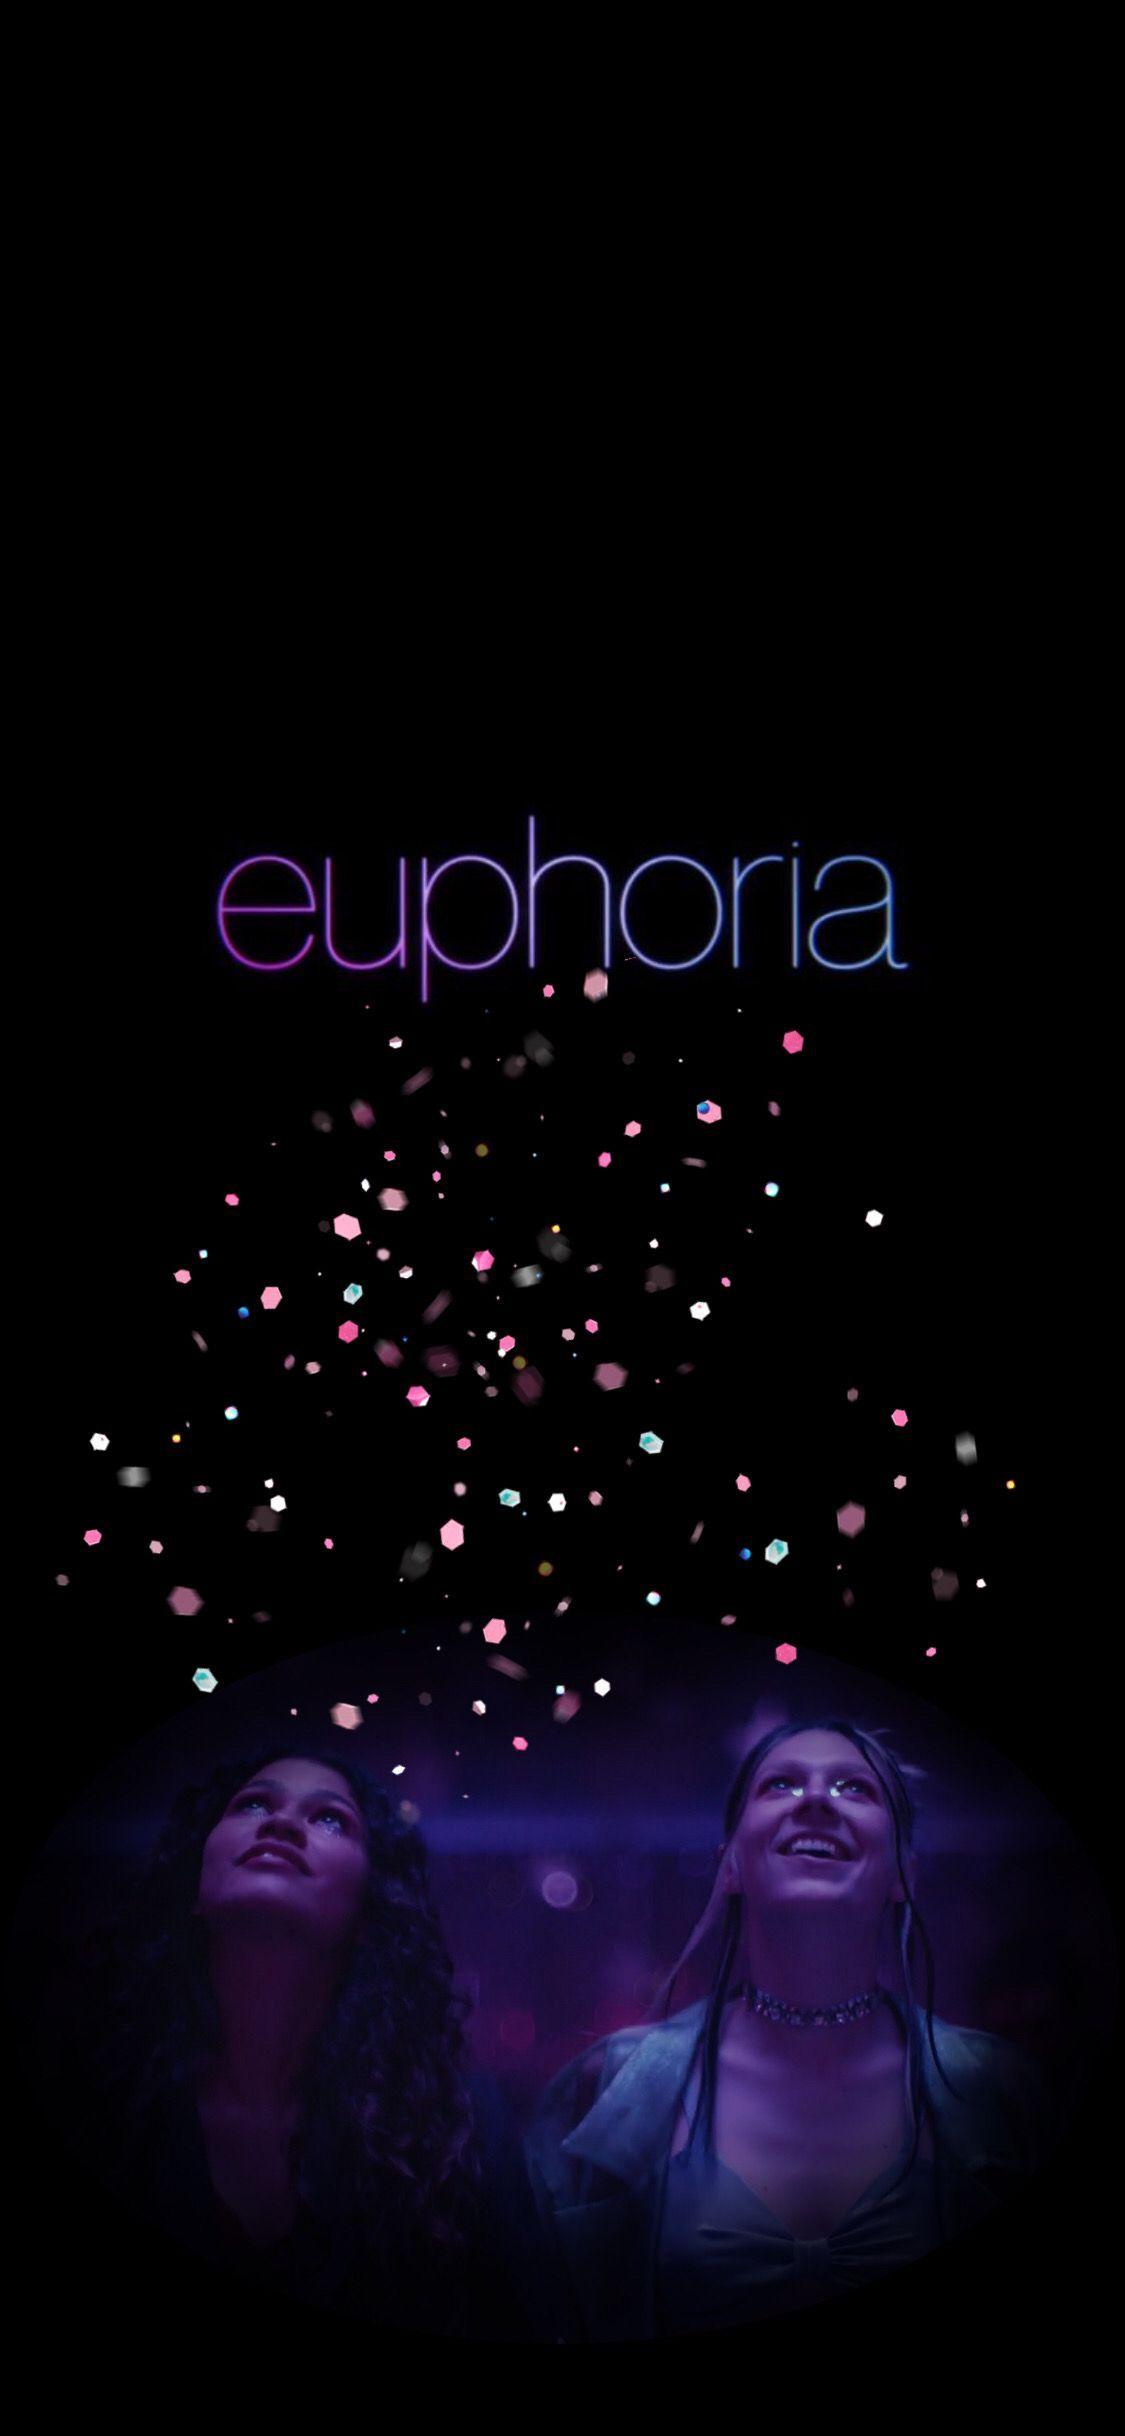 Zendaya Wallpapers Iphone Wallpapers Zendaya In 2020 Euphoria Aesthetic Wallpapers Photo Wall Collage